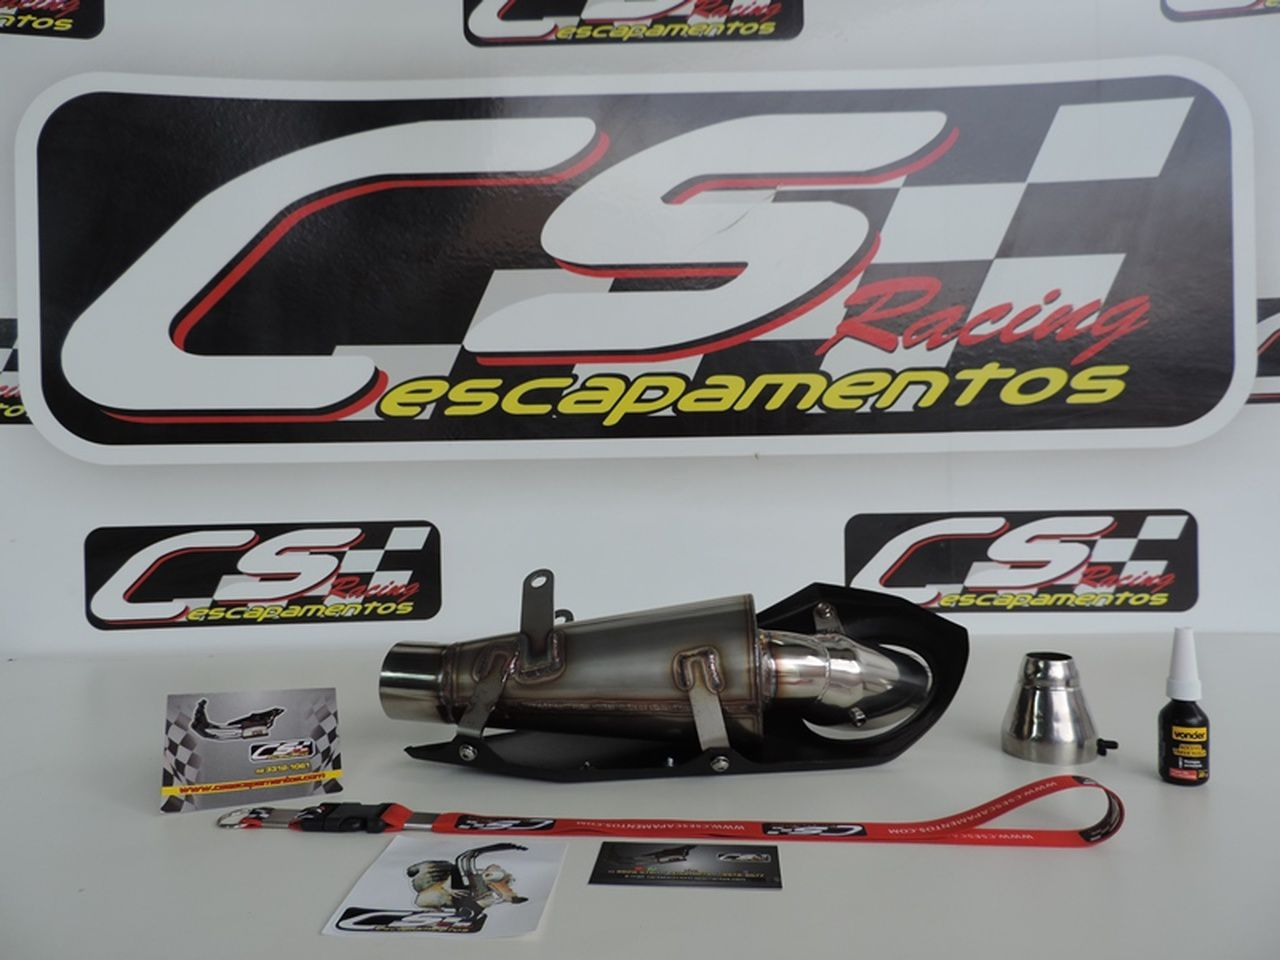 Ponteira Escapamento Esportivo | CS Racing |Ninja  ZX-6R (2010 - 2013)